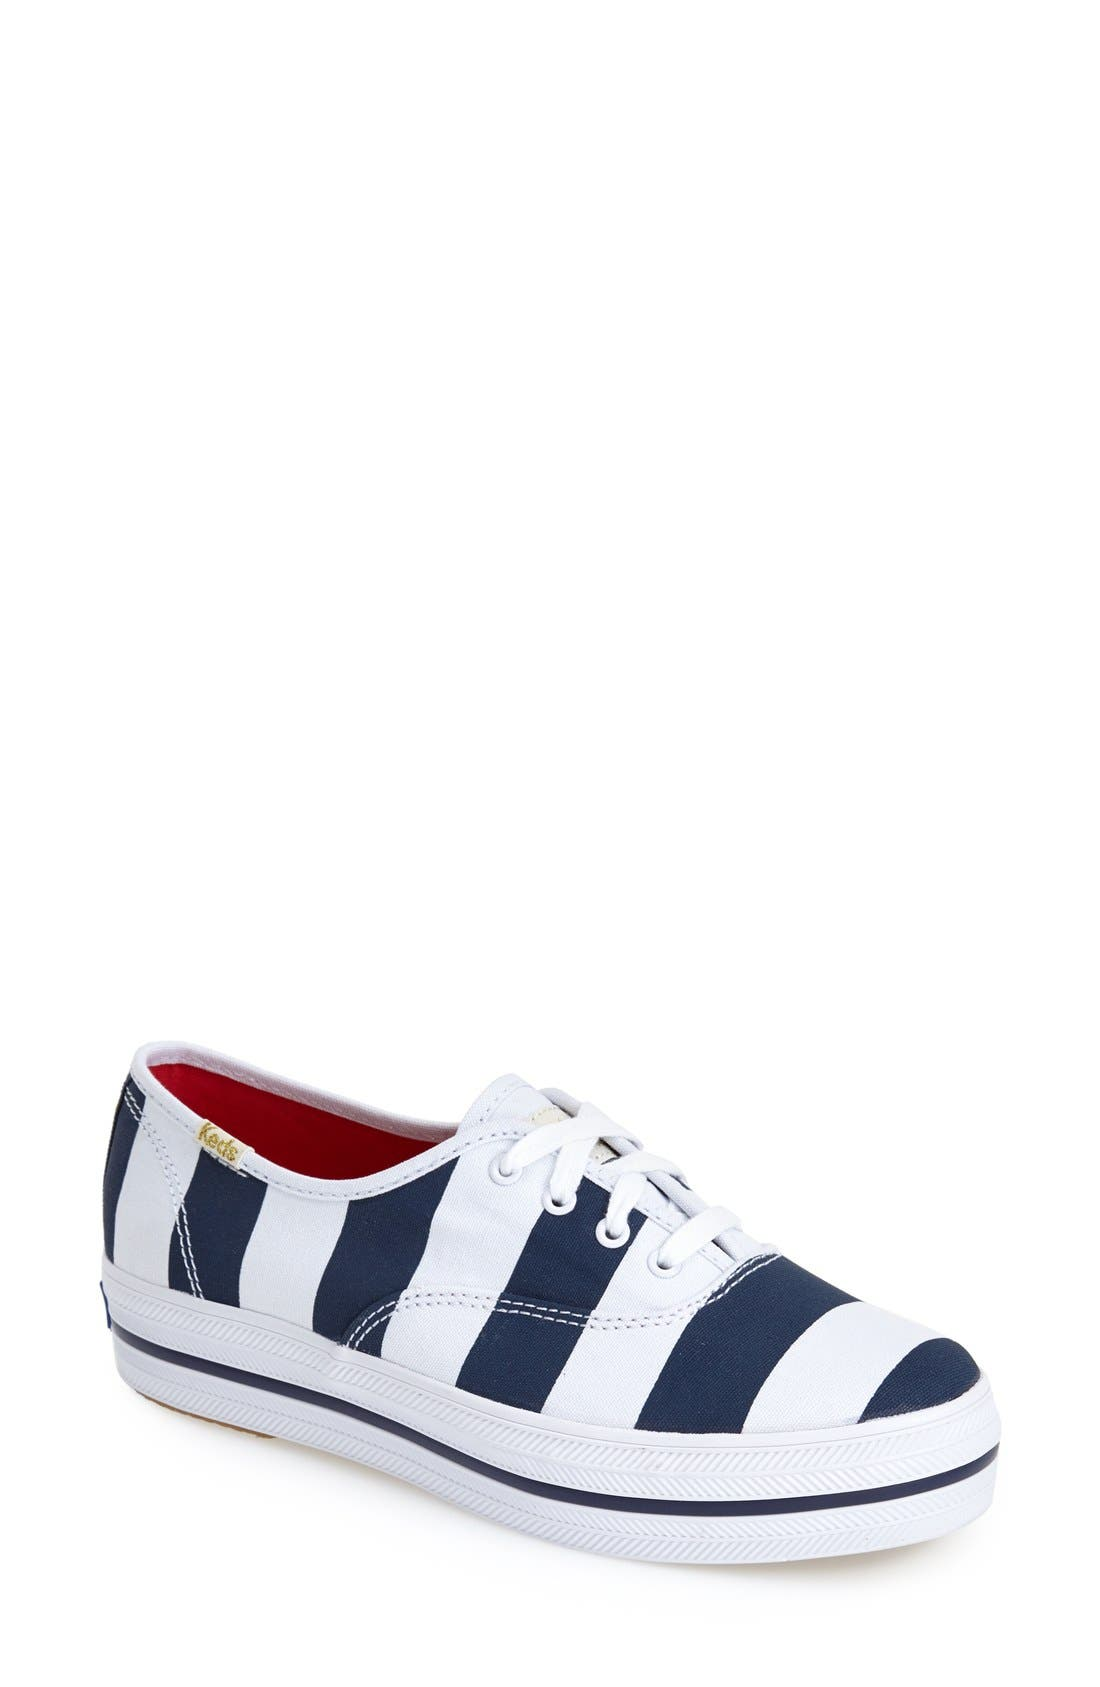 Alternate Image 1 Selected - Keds® for kate spade new york 'triple kick' sneaker (Women)